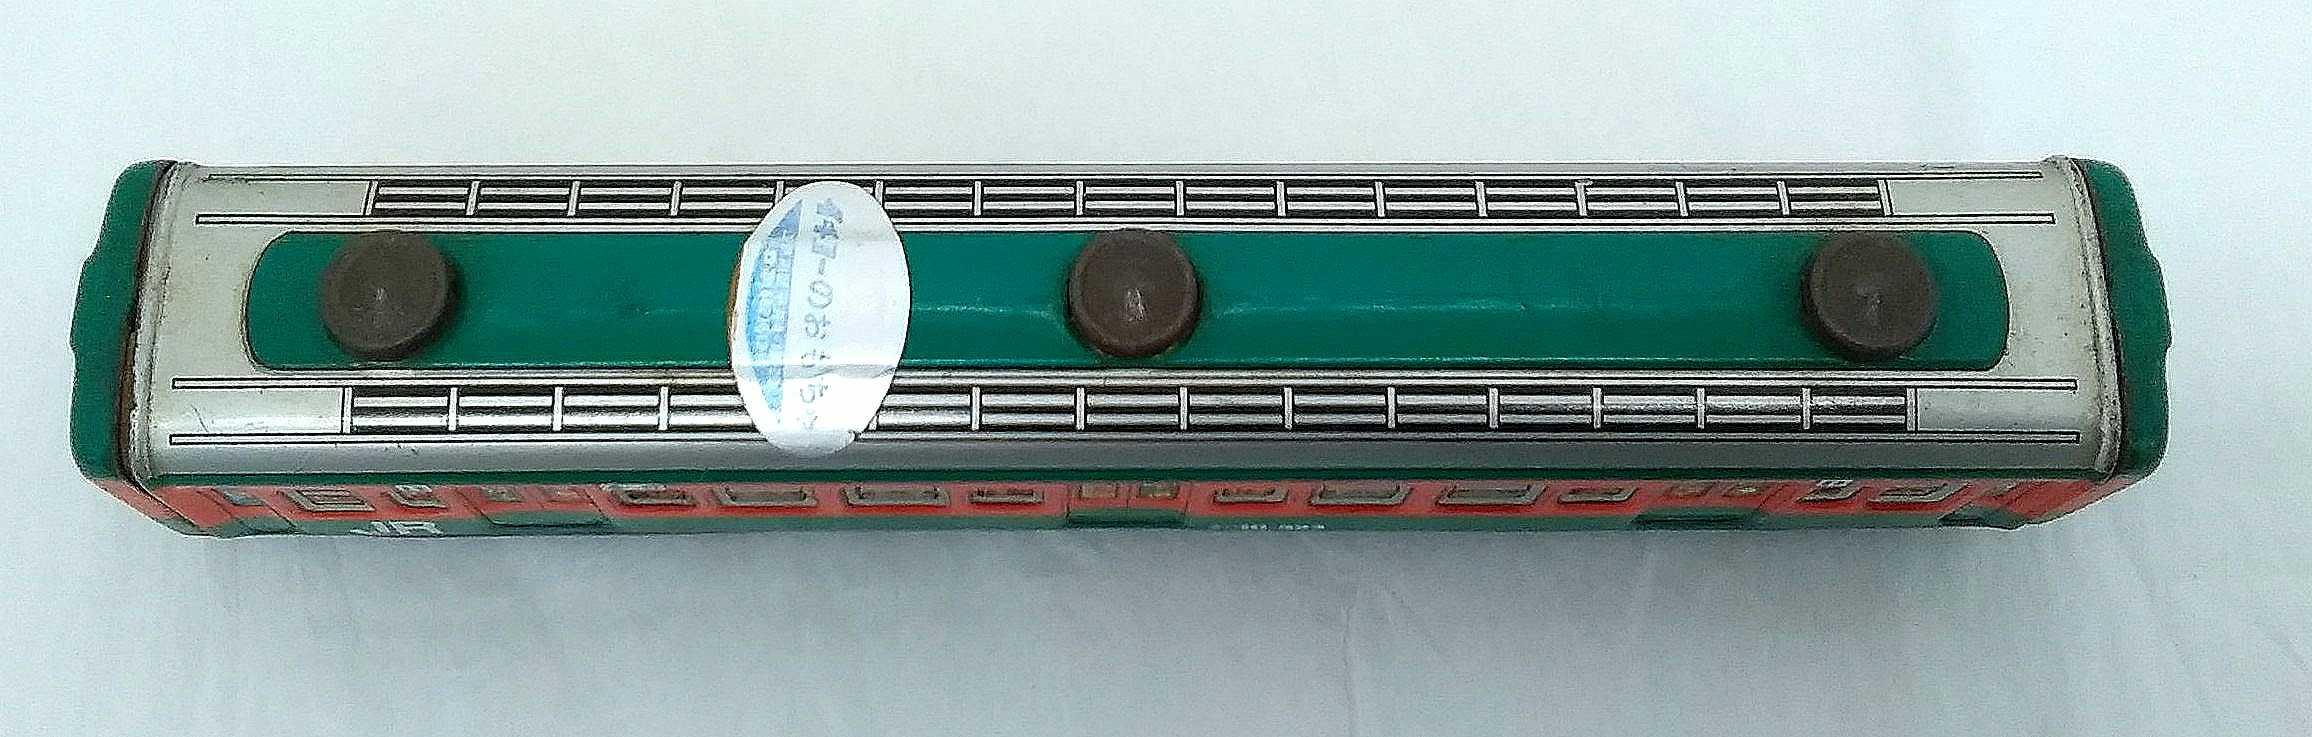 JR電車 ブリキ|イチコー